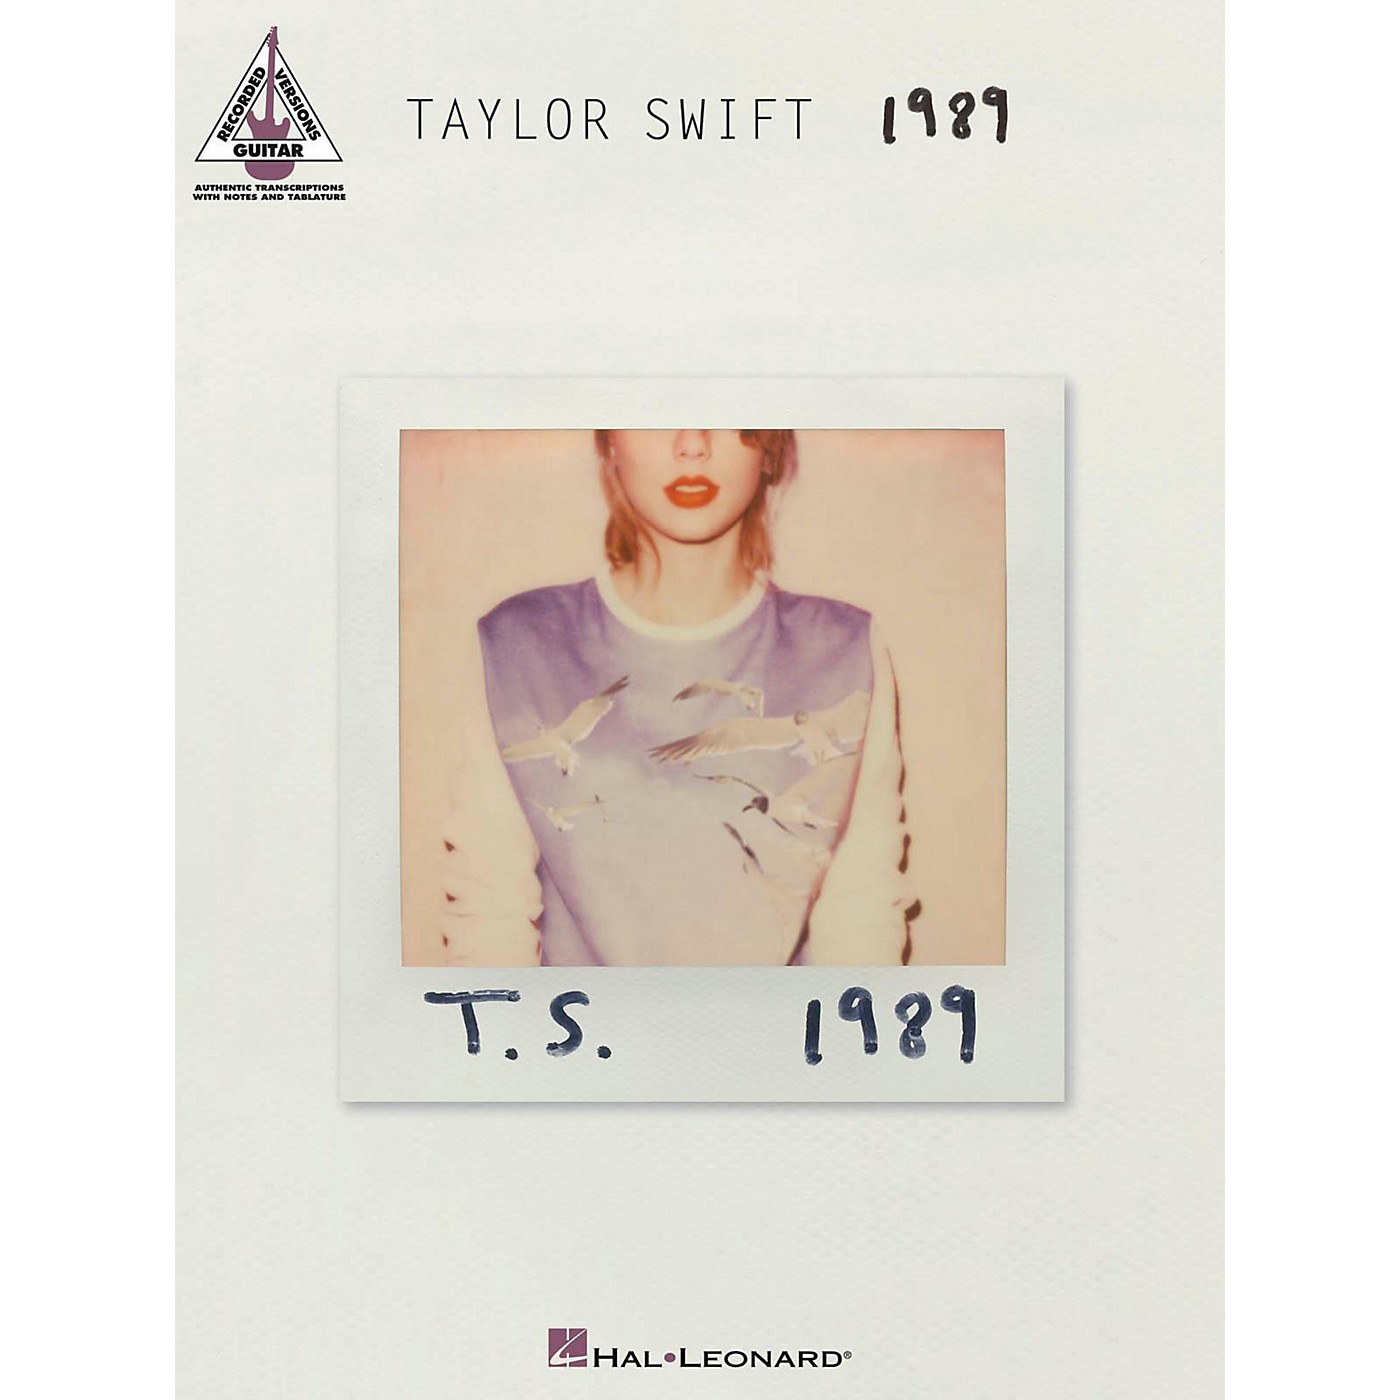 Hal Leonard Taylor Swift - 1989 Guitar Tab Songbook thumbnail